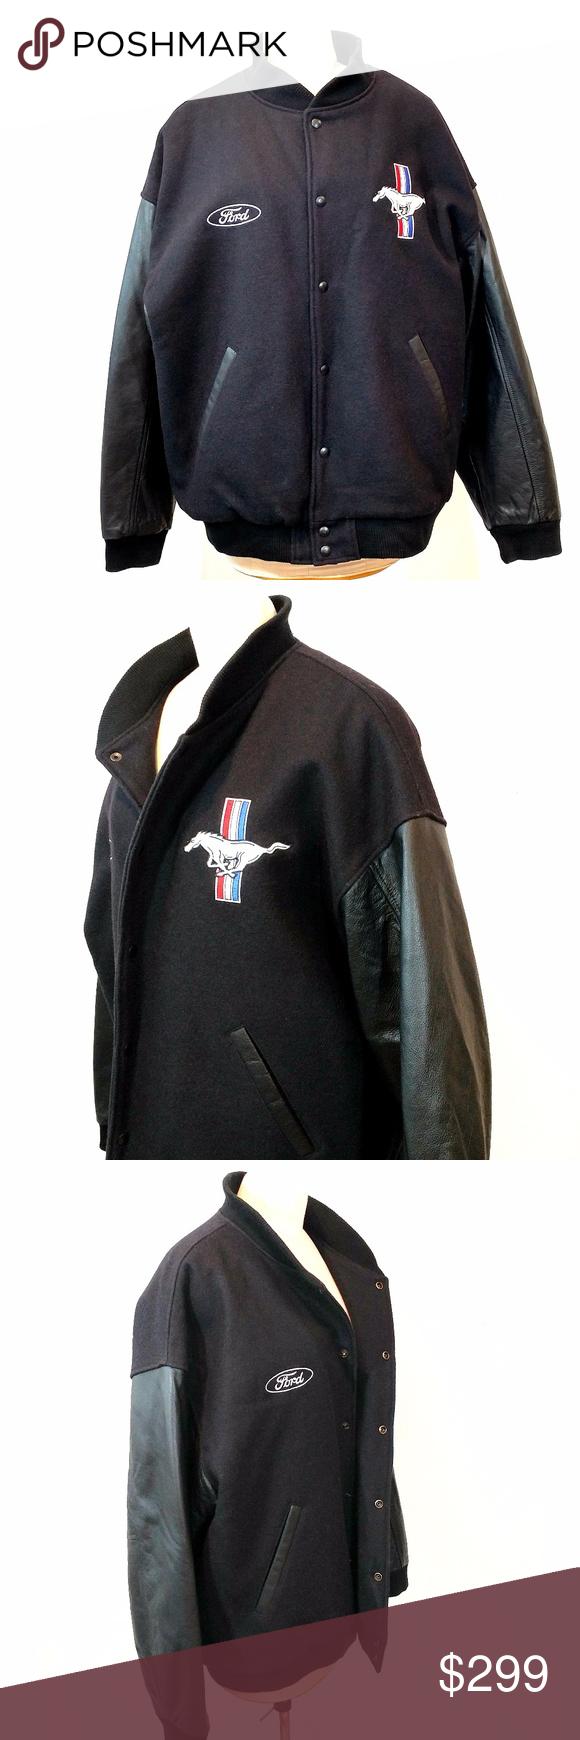 Vintage Ford Mustang Wool Leather Varsity Jacket Leather Varsity Jackets Clothes Design Fashion Design